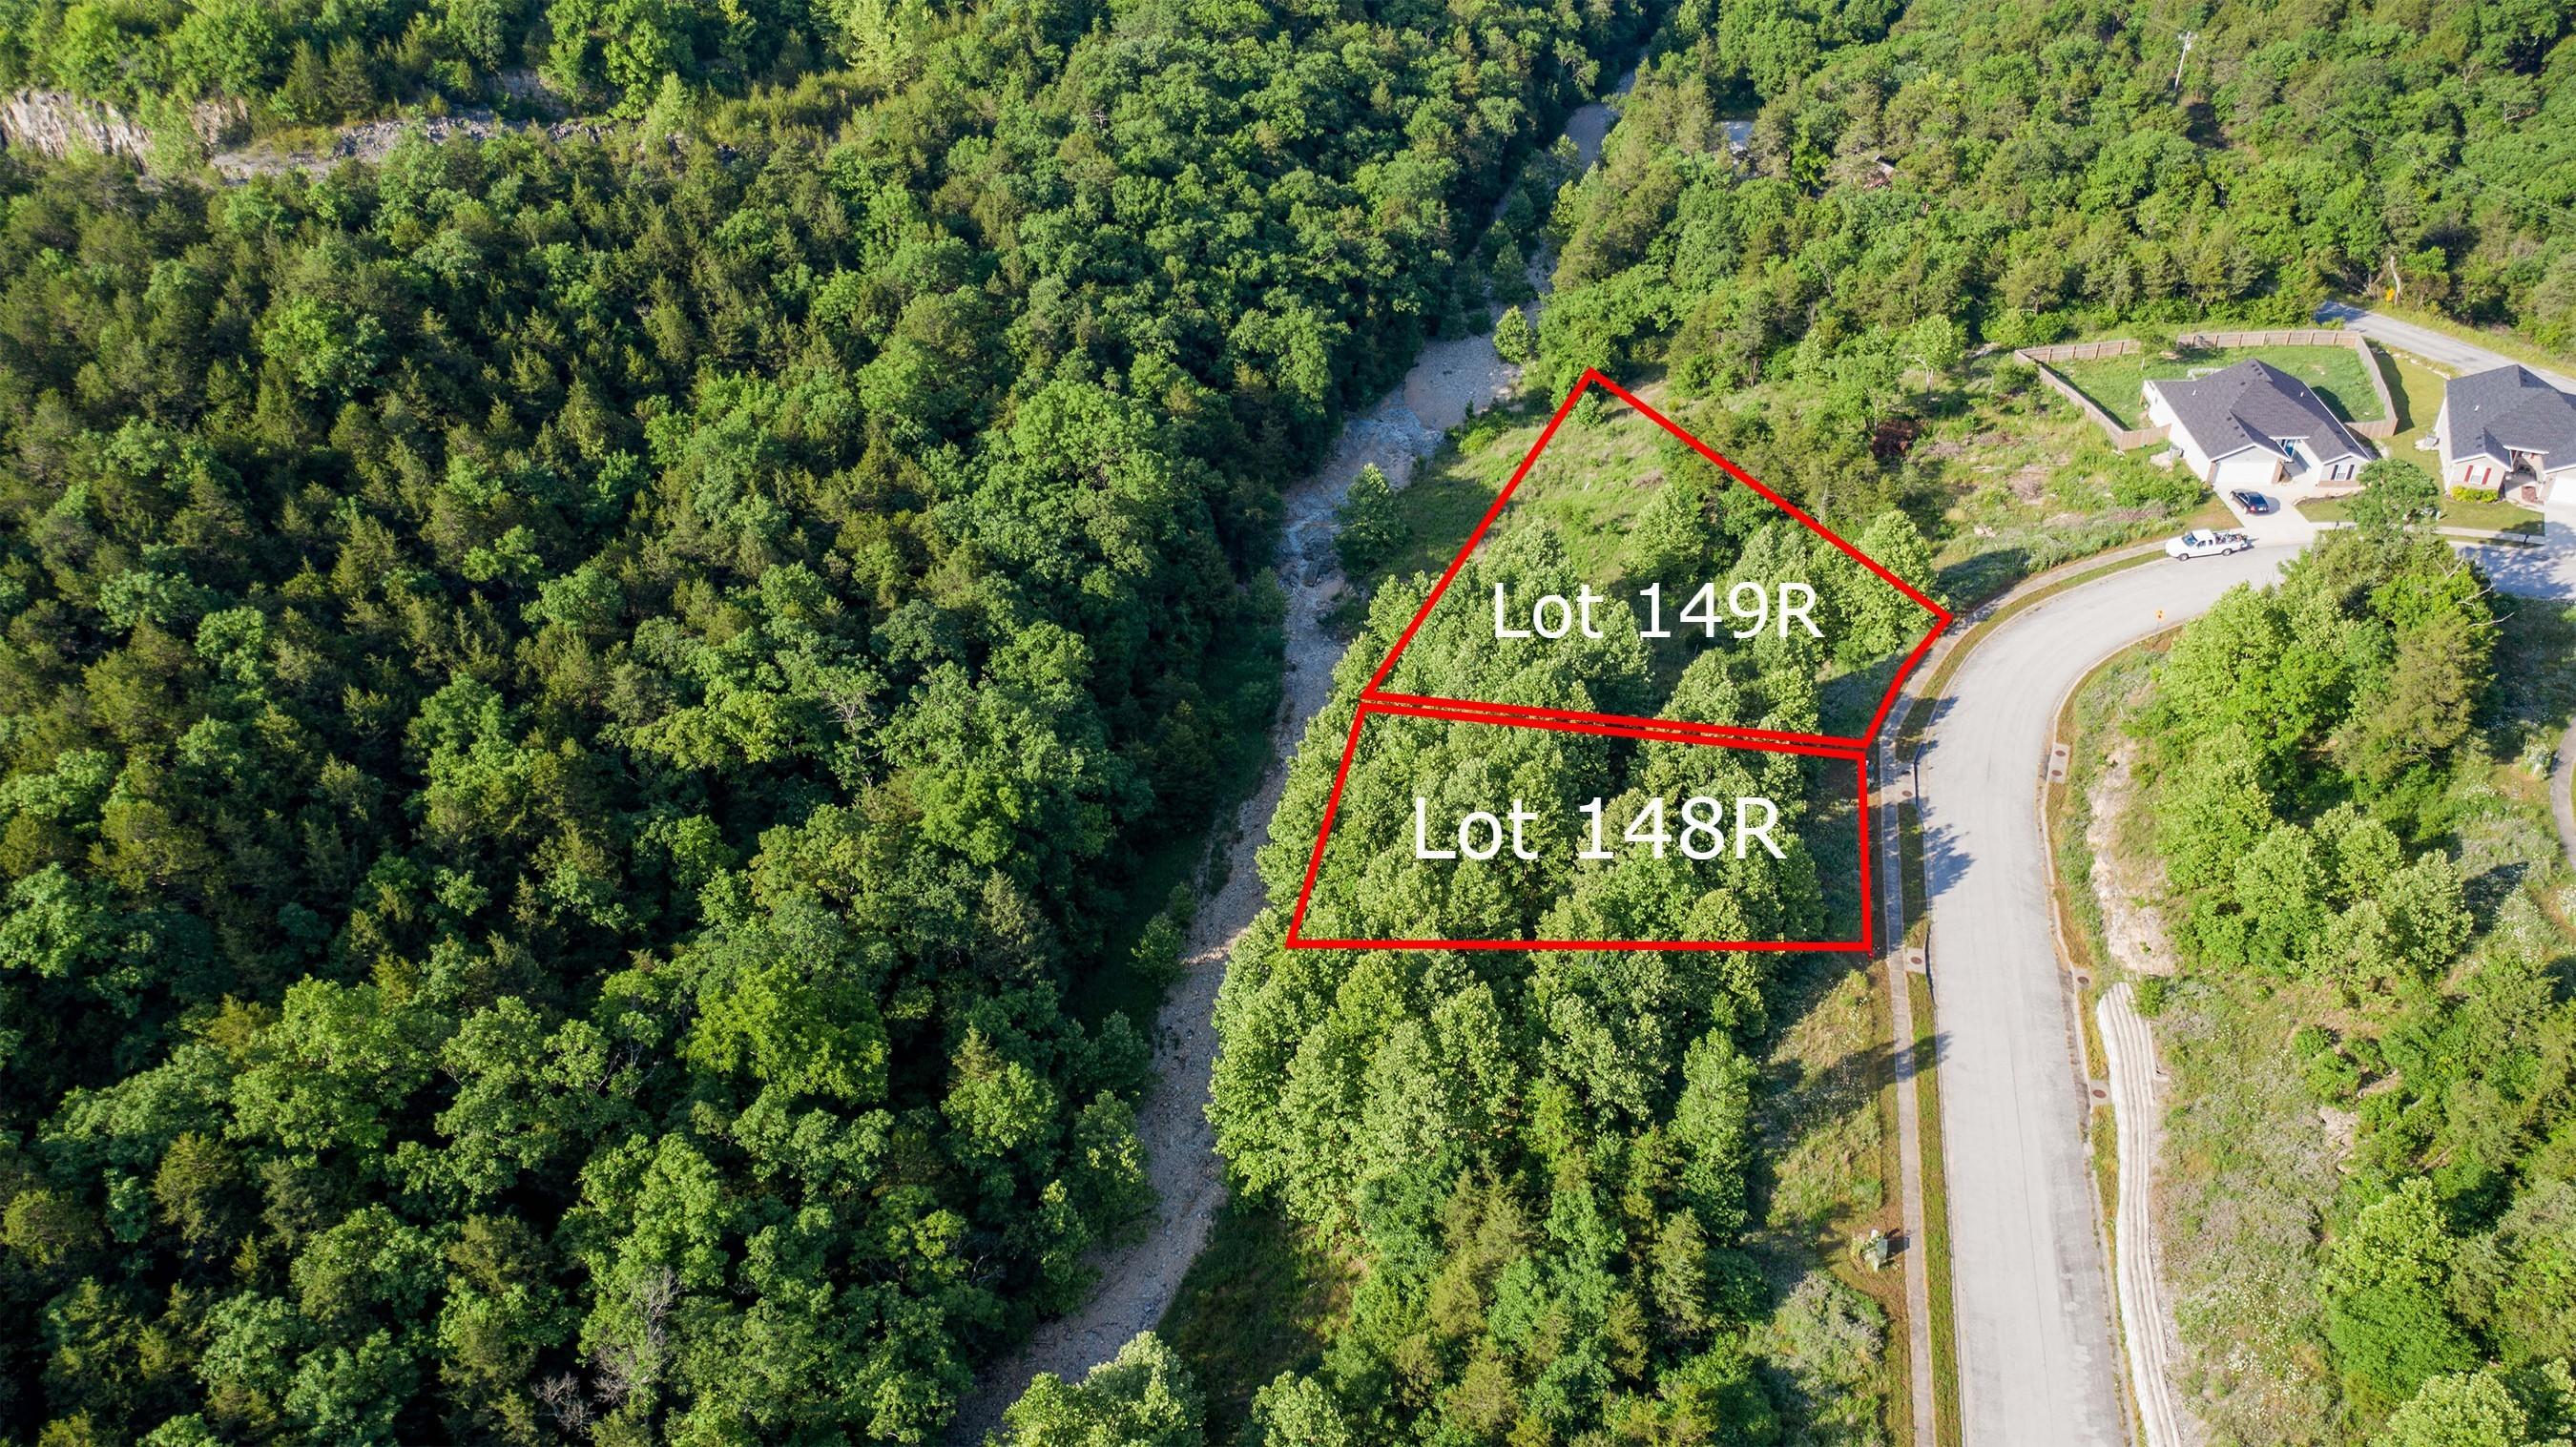 000 Country Ridge Way UNIT Lot 148r Branson, MO 65616